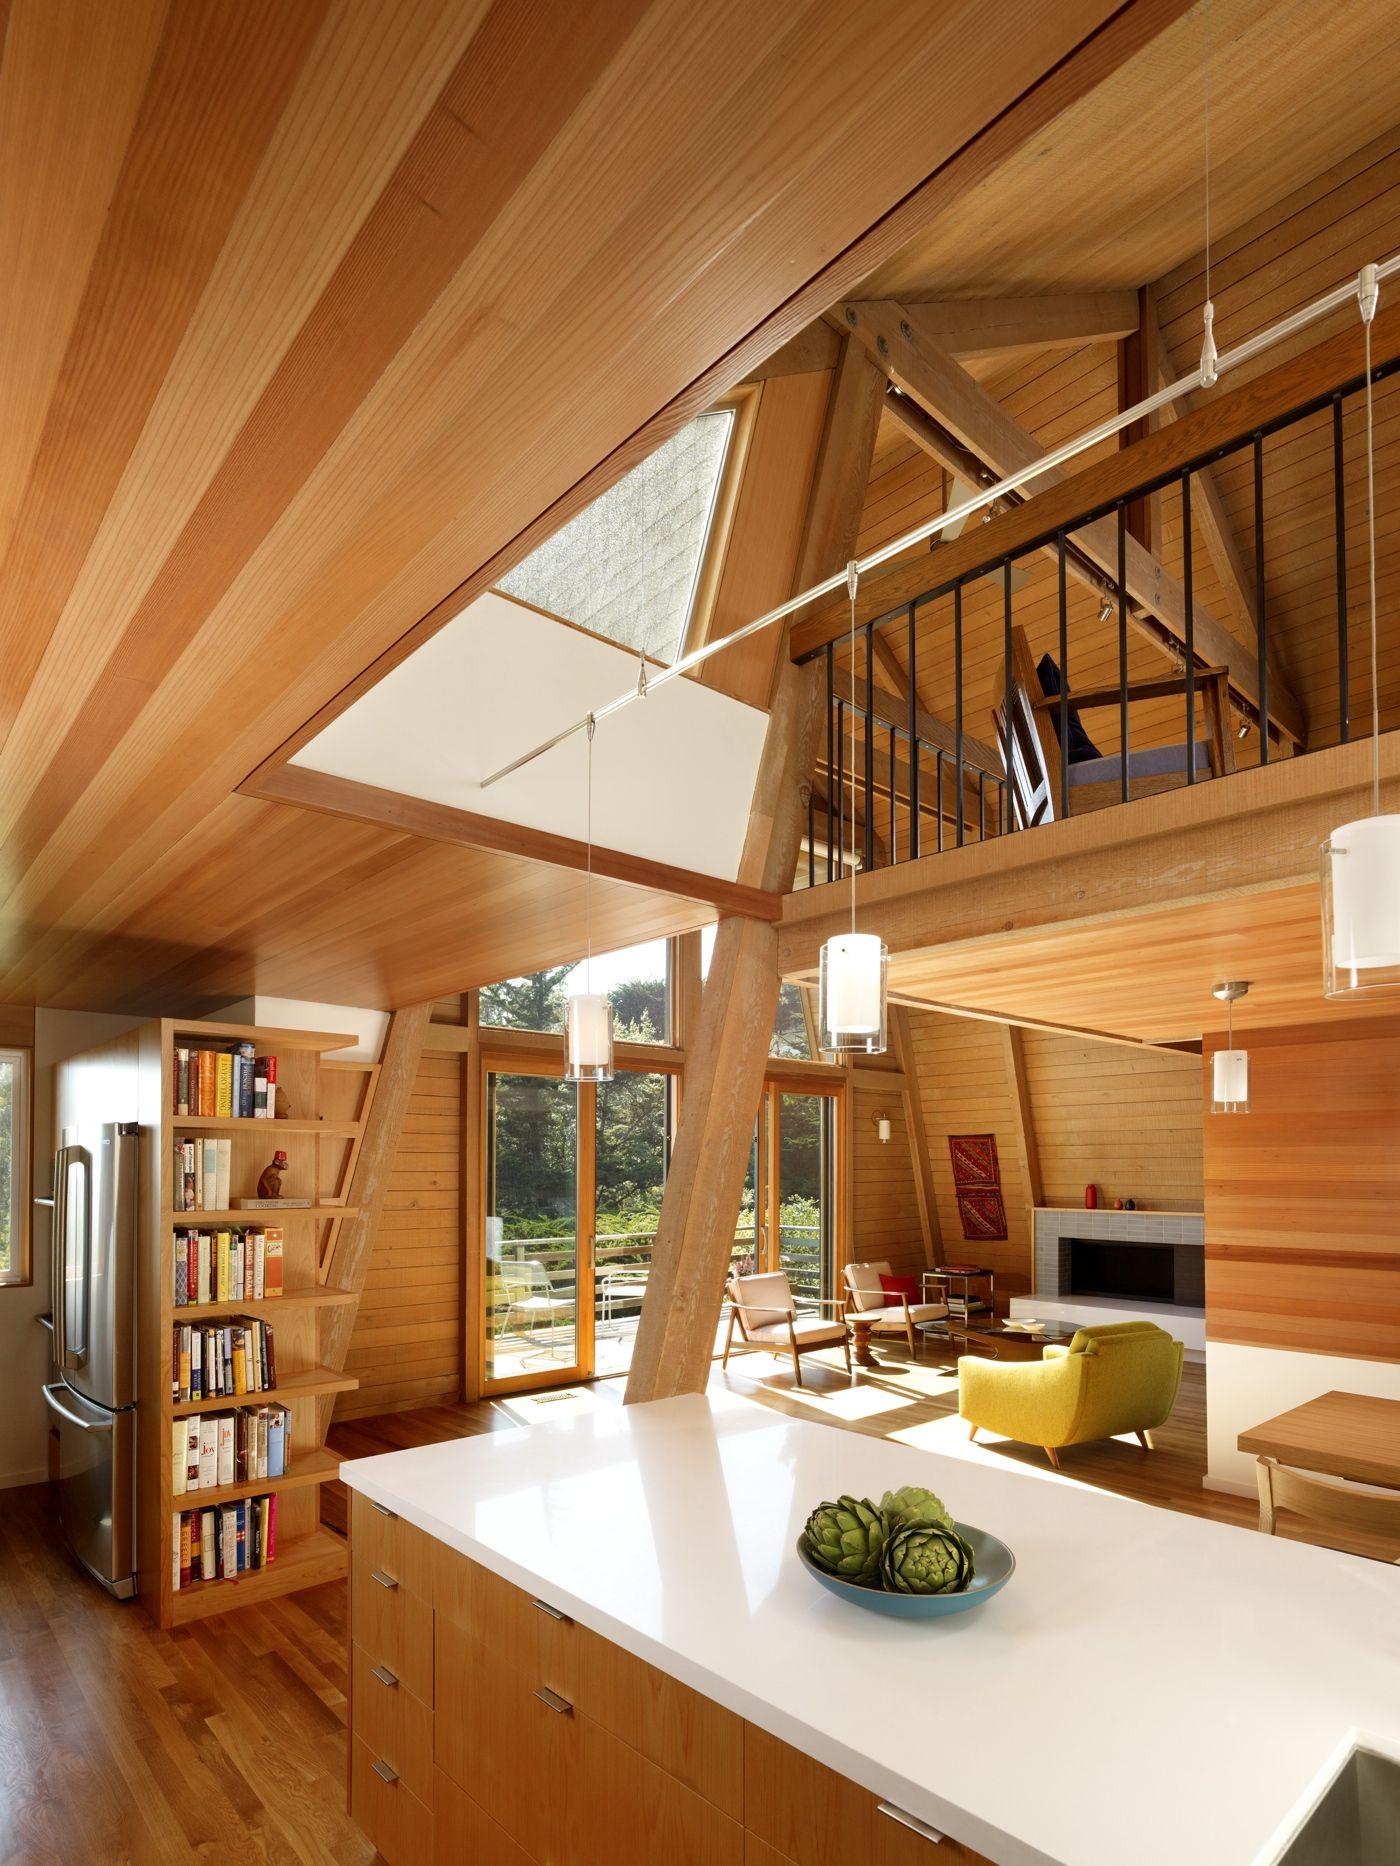 Corner window kitchen sink  clean lines and wooden comfort  kitchen remodel bay area ca